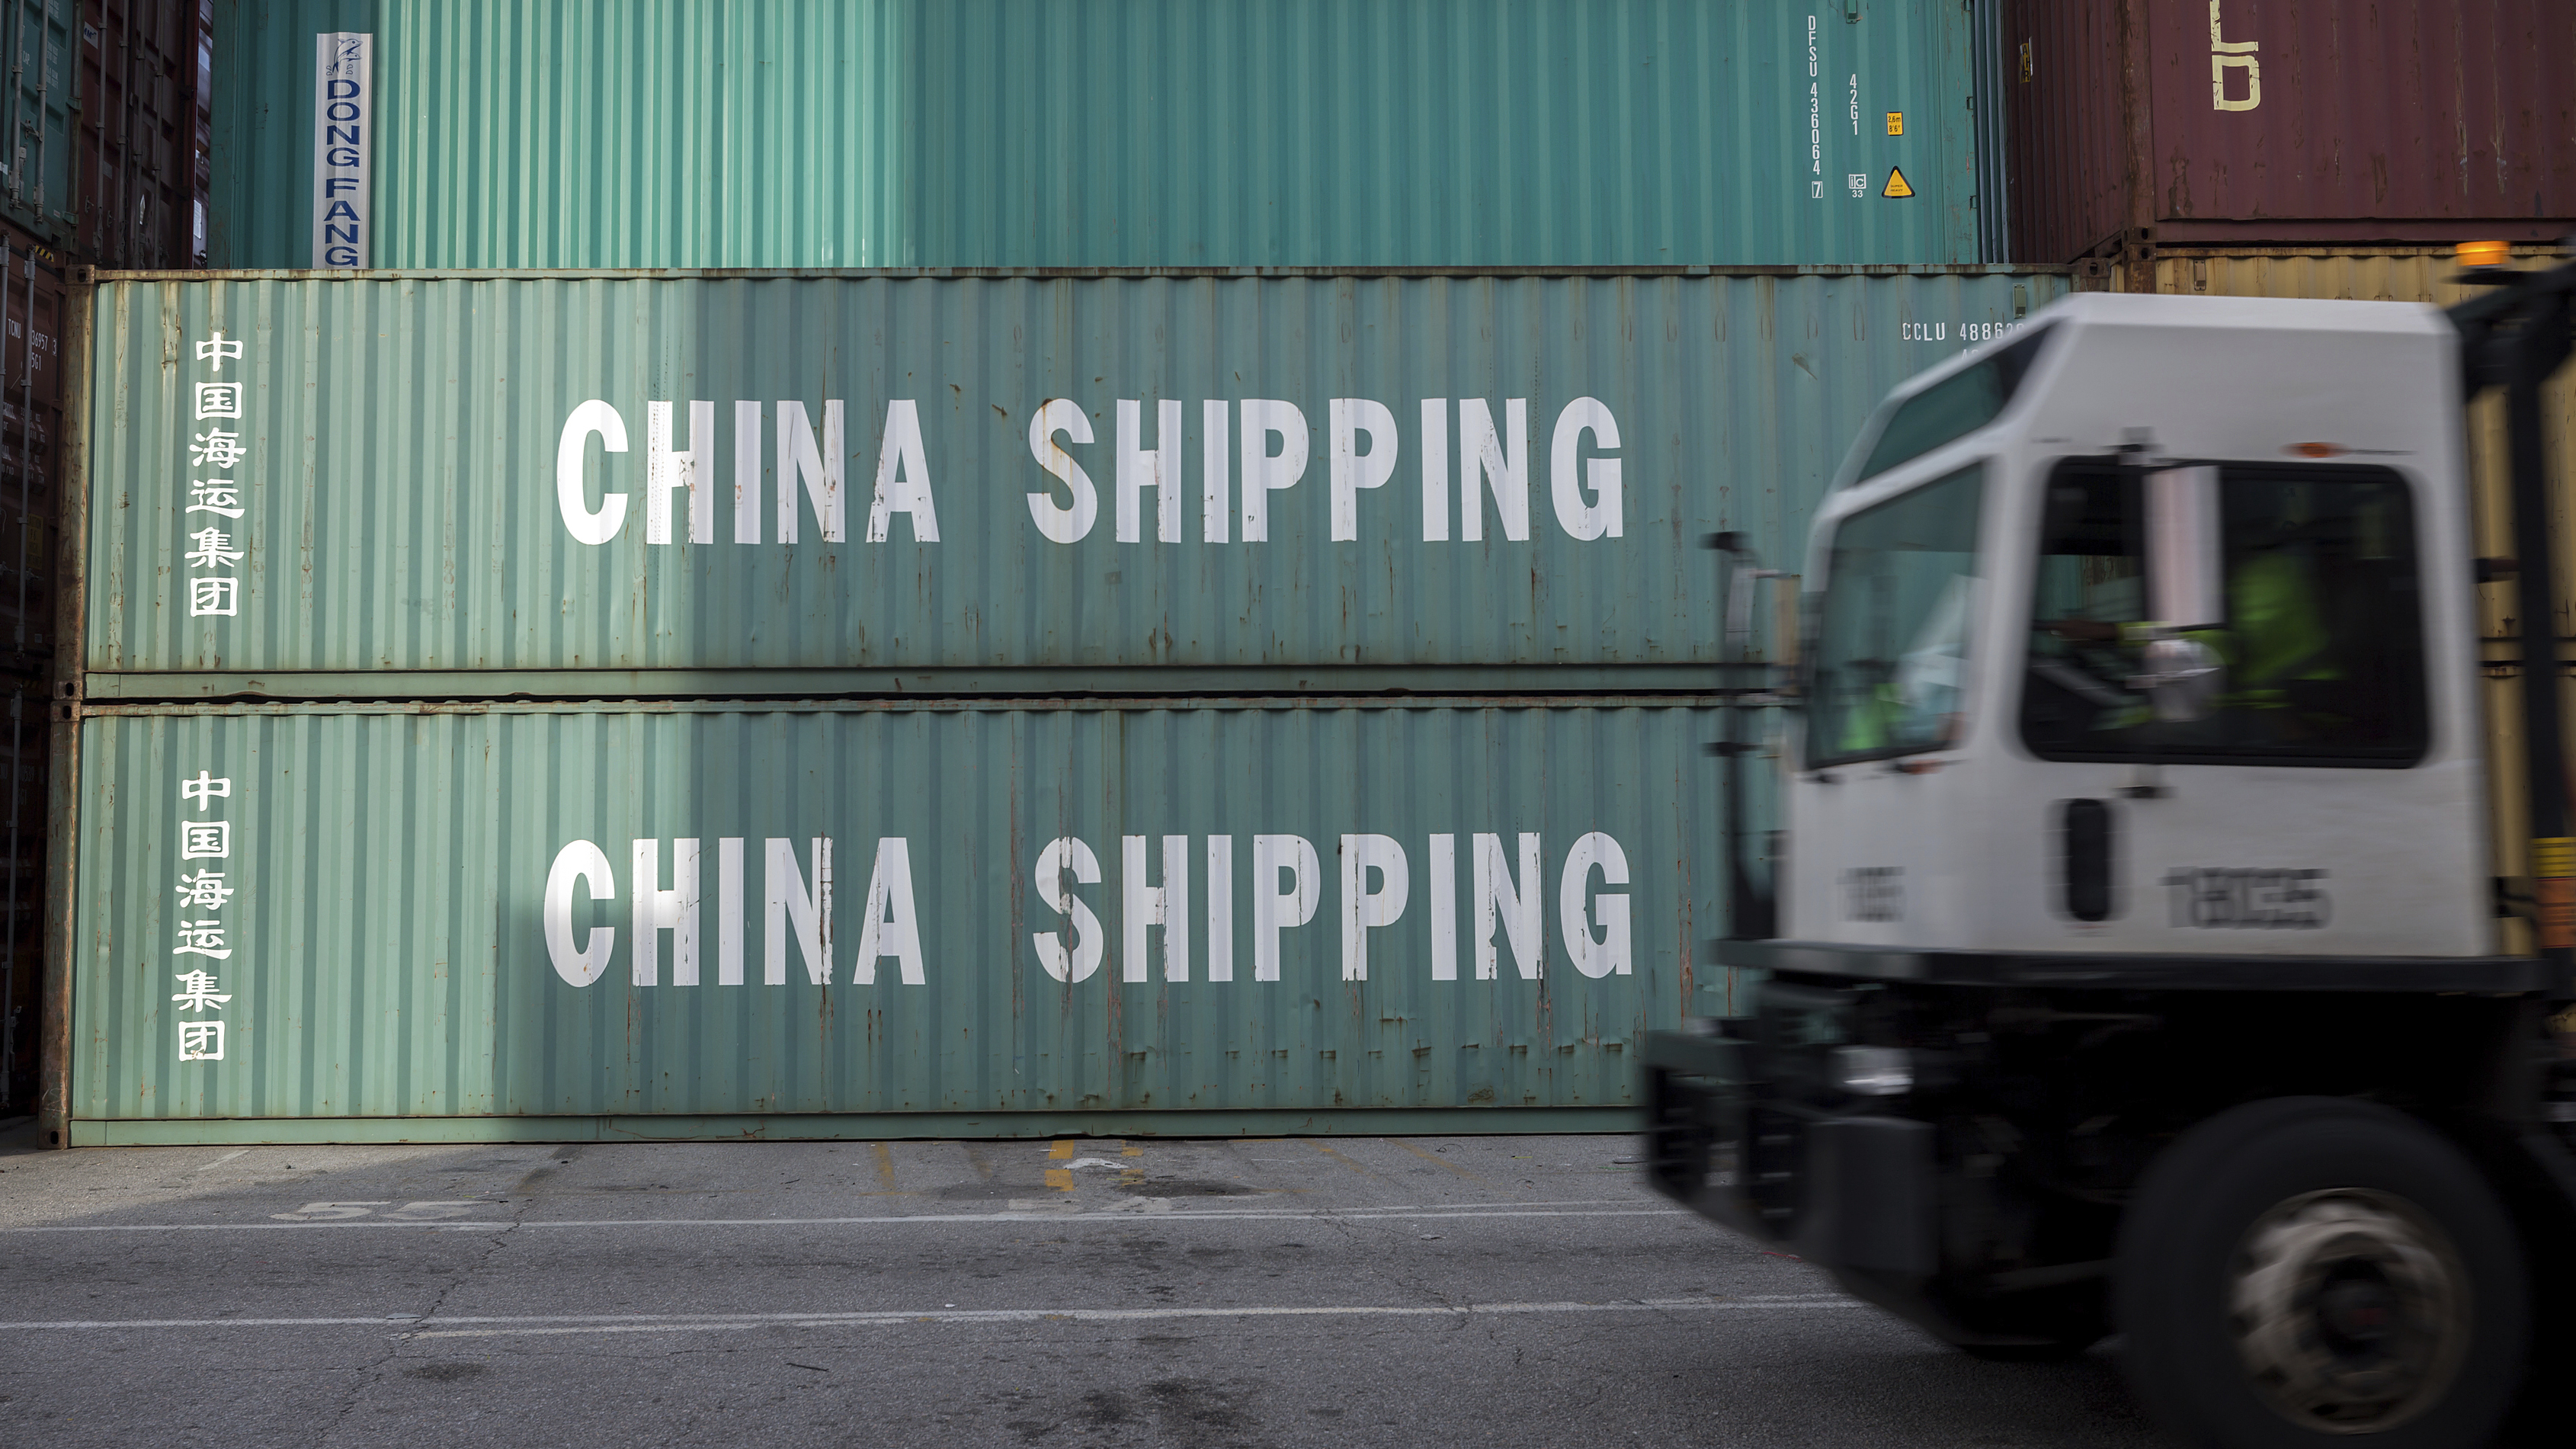 npr.org - Avie Schneider - Trump Sets Tariffs On $200 Billion In Imports From China